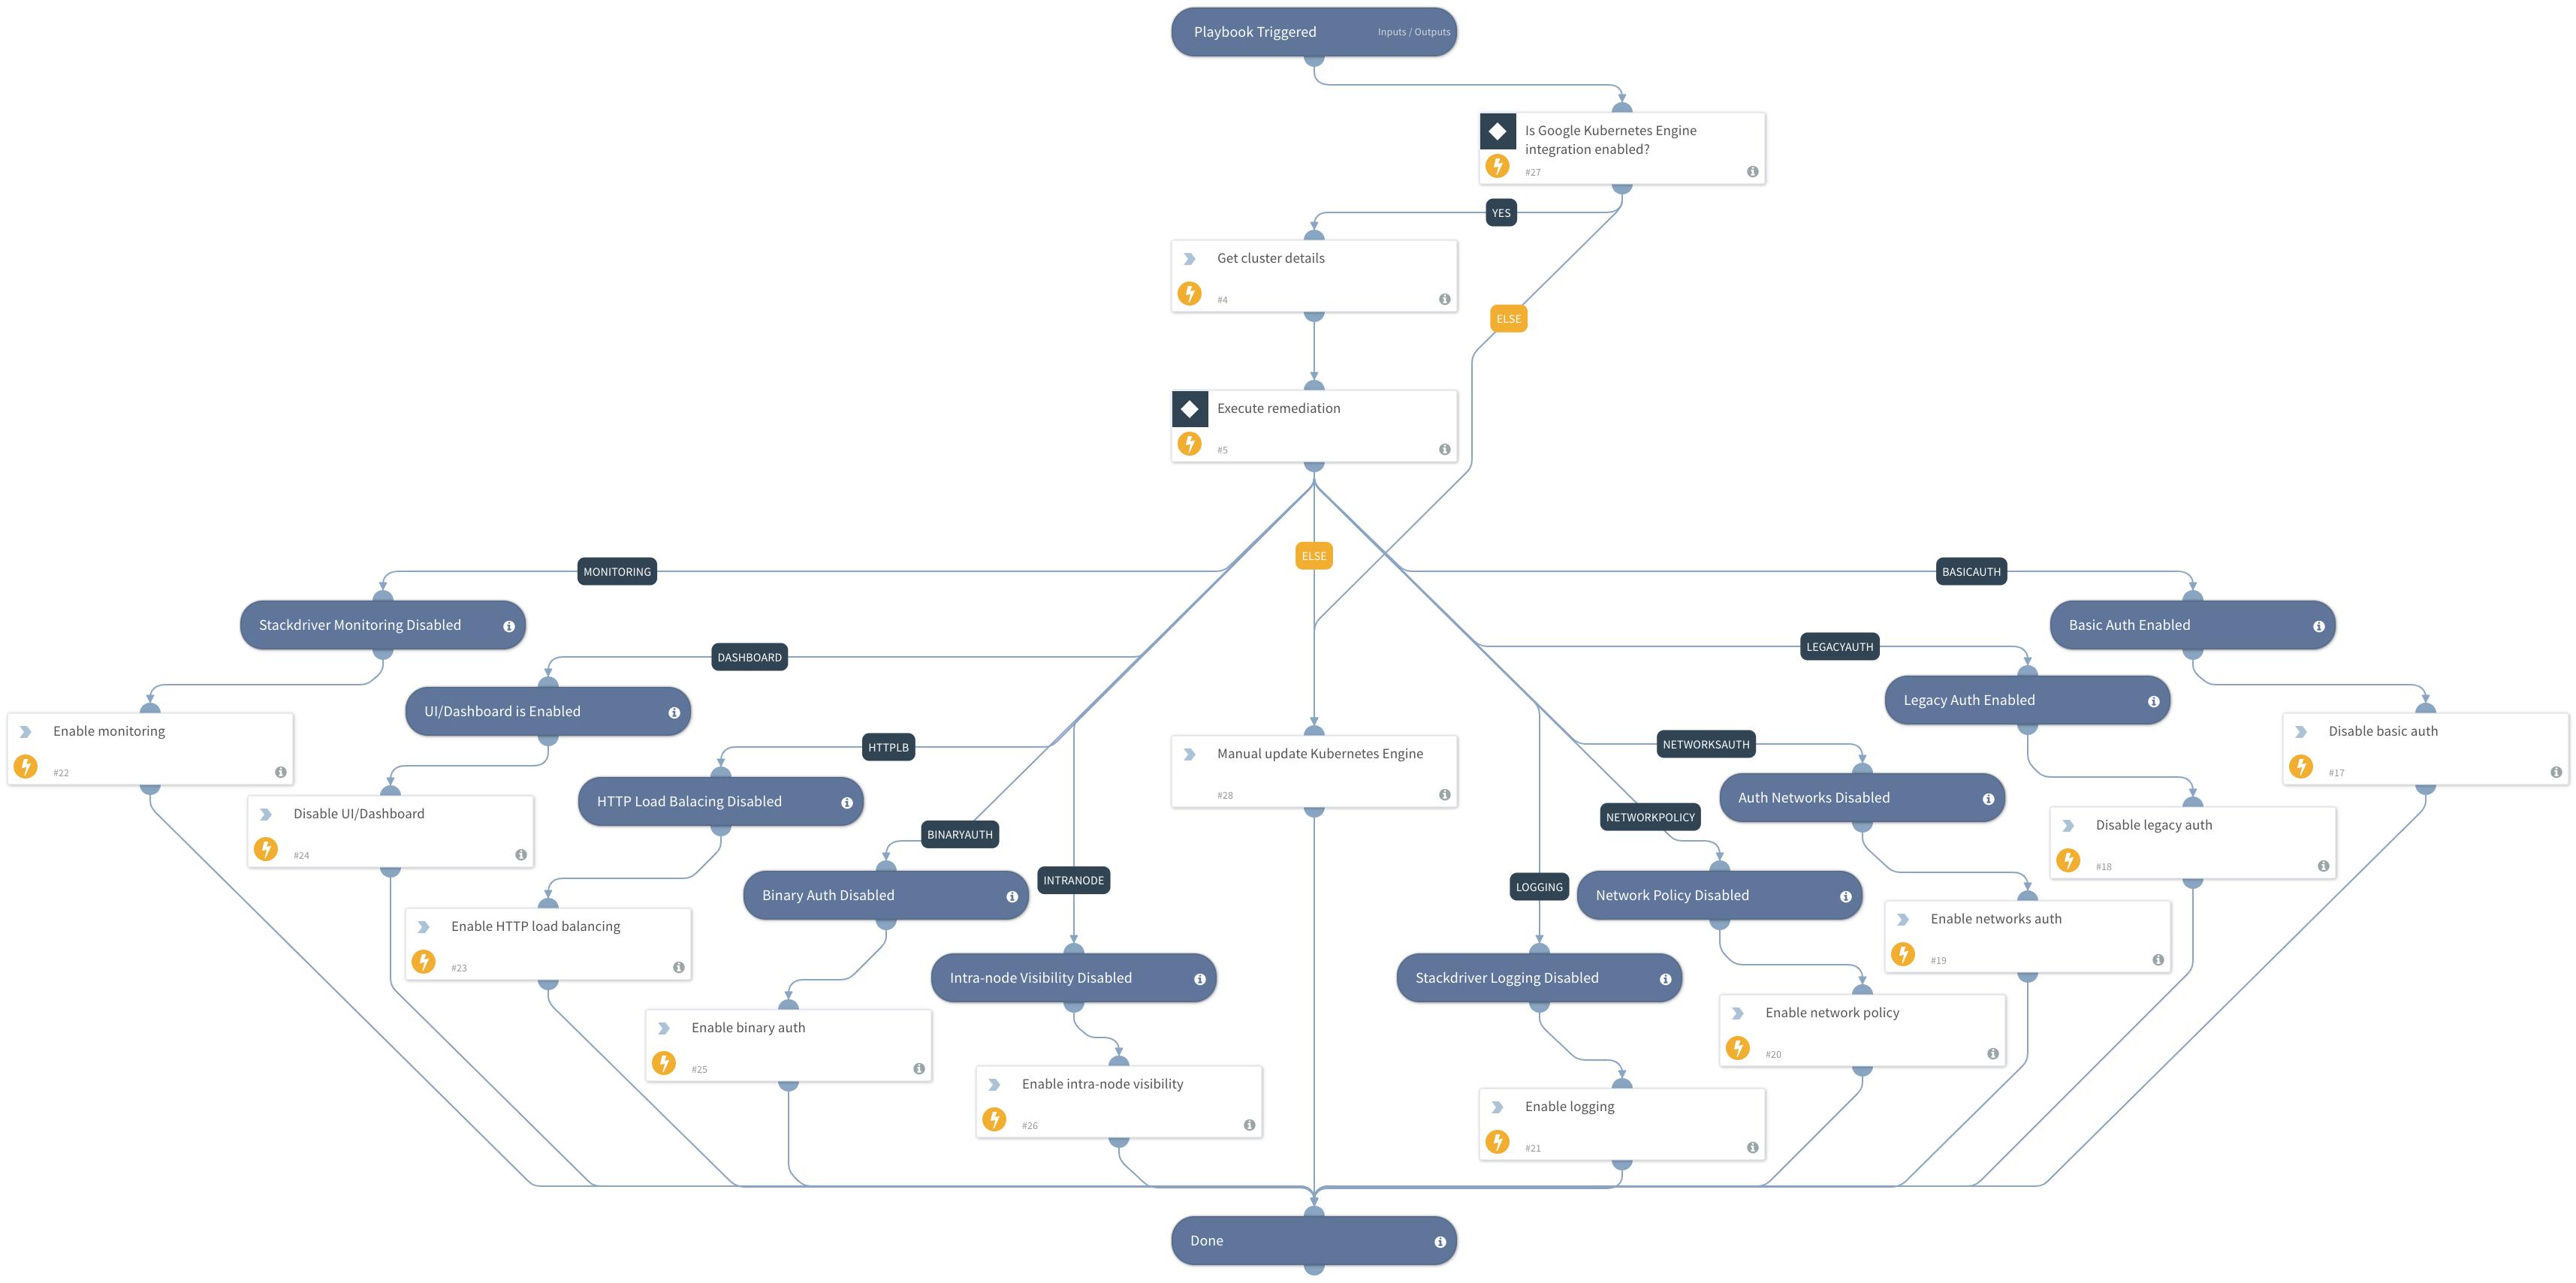 Prisma Cloud Remediation - GCP Kubernetes Engine Cluster Misconfiguration